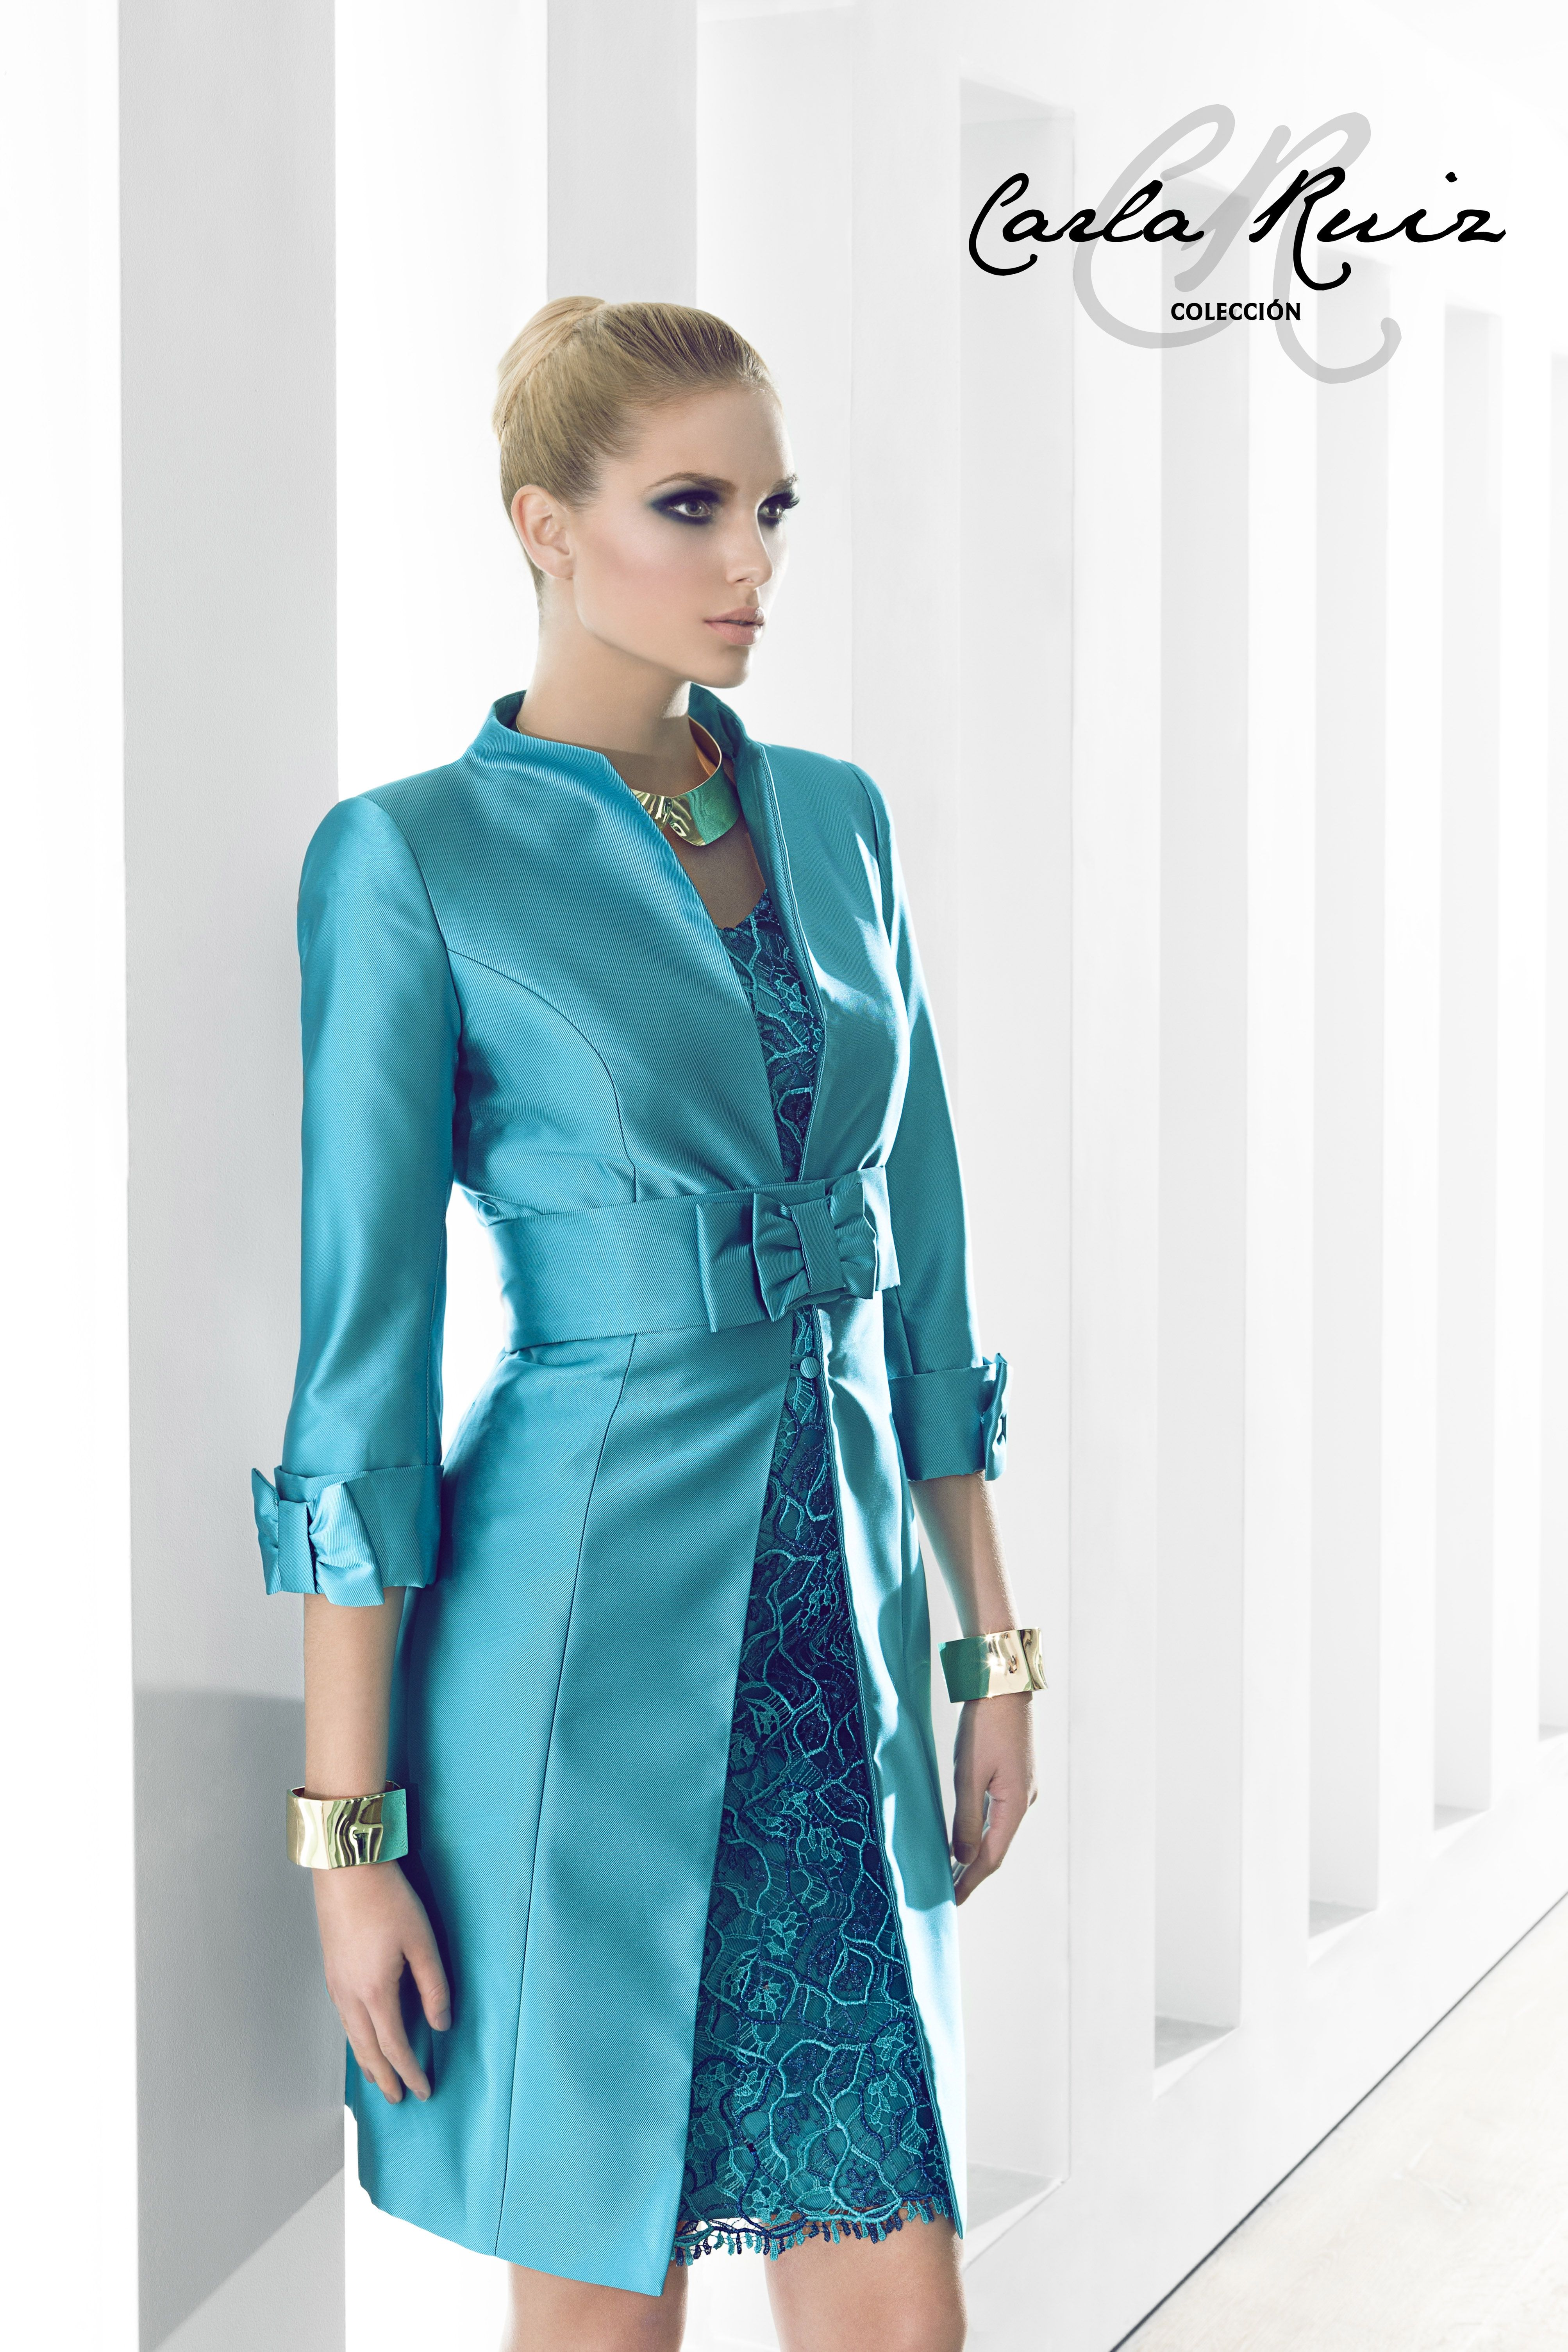 186233 - Vestido de Madrina - Carla Ruiz | madrina | Pinterest ...